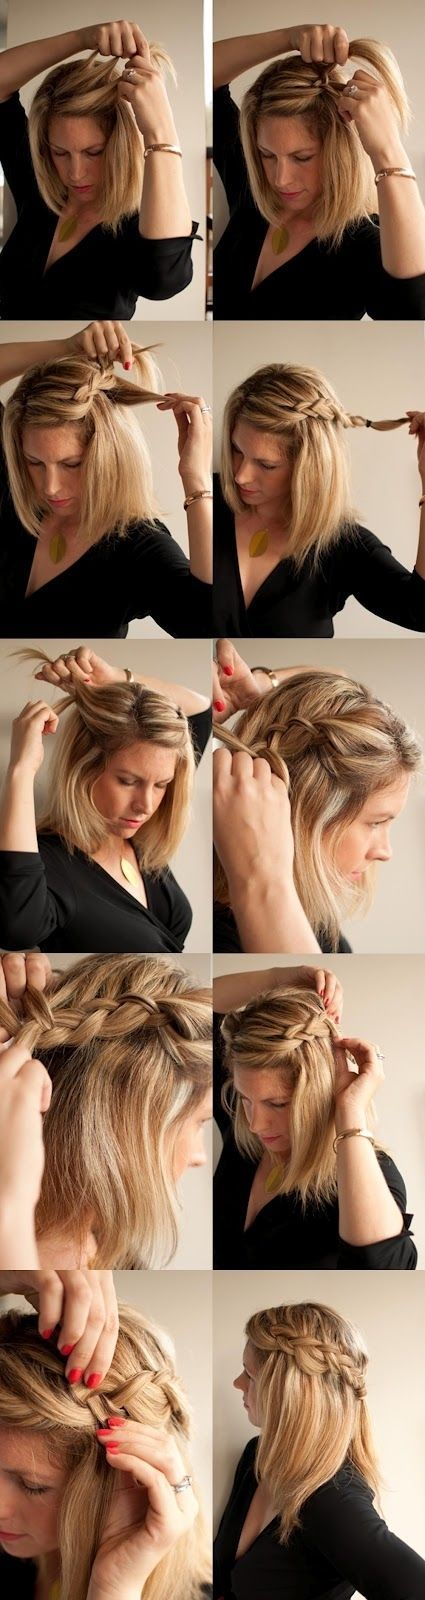 Cascade Braids for Medium-Length Hair